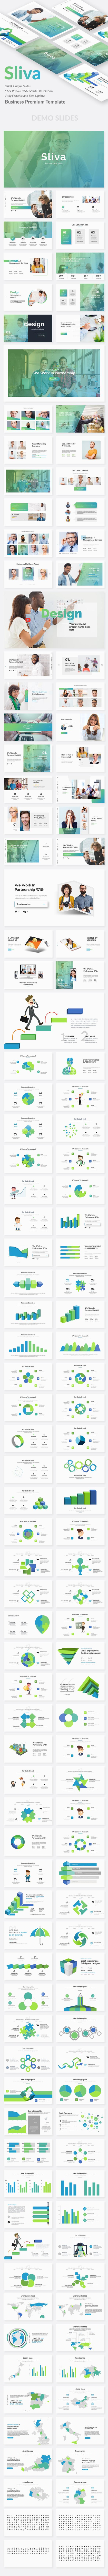 Sliva Business Keynote Template - Business Keynote Templates